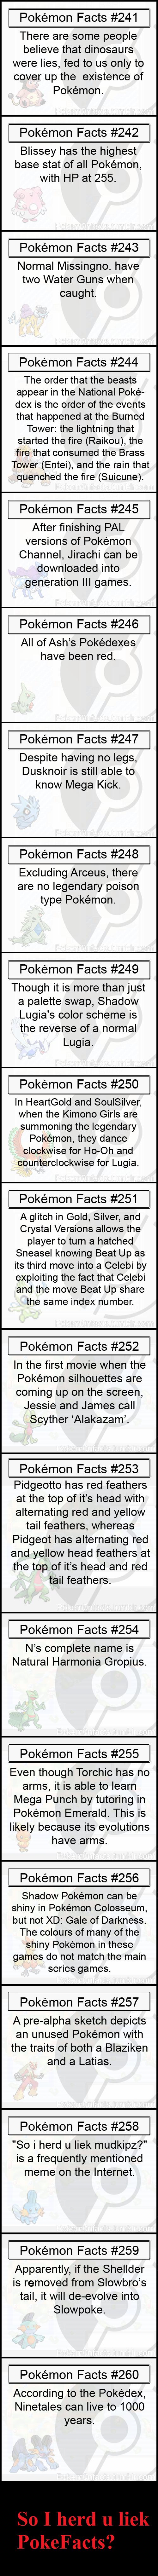 Pokemon Facts 13. Part 12: /channel/pokemon/Pokemon+Facts+12/lws... Part 11: www.funnyjunk.com/channel/pokemon/Pokemon+Facts+11/xprmGkc/ Part 10: funnyjunk.com/ Pokemon Facts 13 Part 12: /channel/pokemon/Pokemon+Facts+12/lws 11: www funnyjunk com/channel/pokemon/Pokemon+Facts+11/xprmGkc/ 10: com/